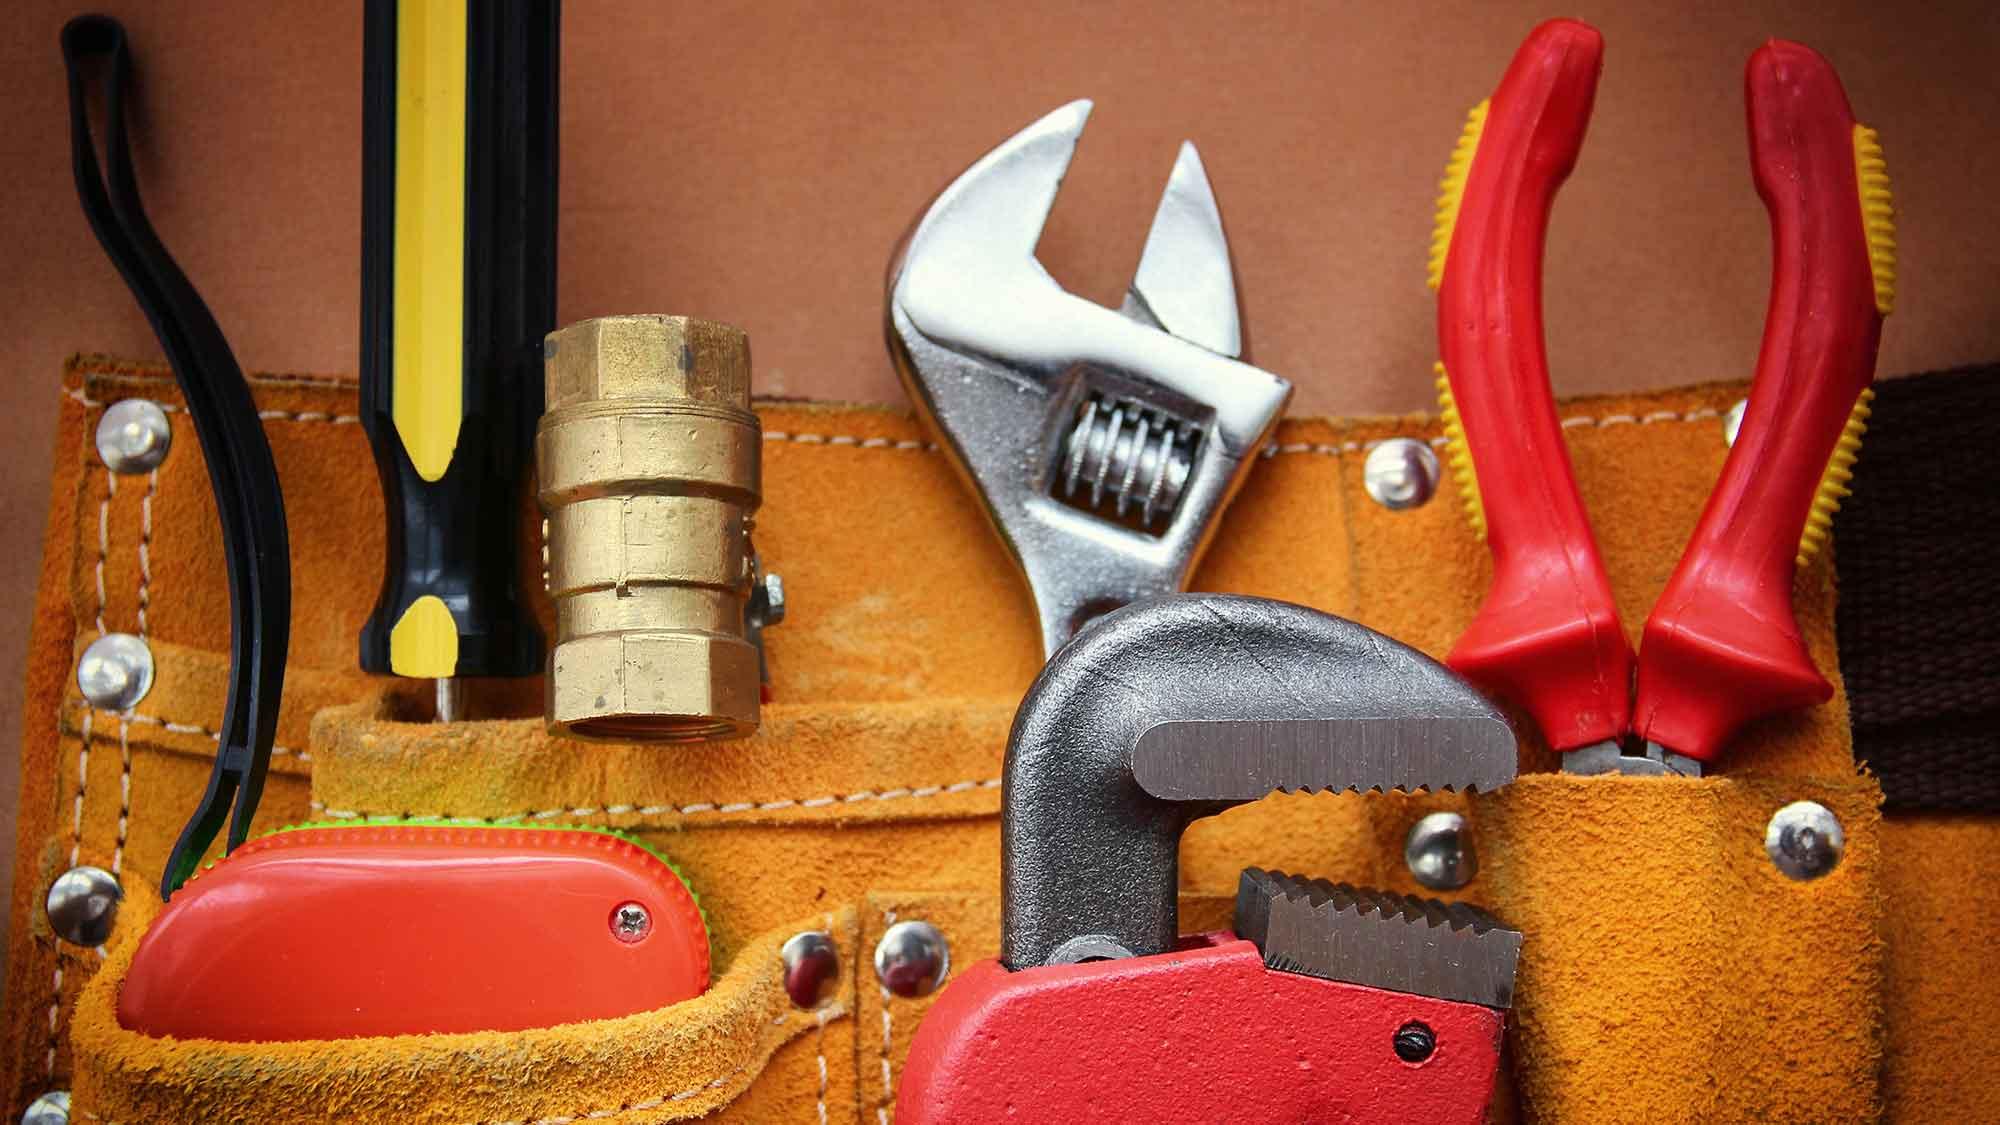 gutter repairs essex maintenance leigh on sea tools